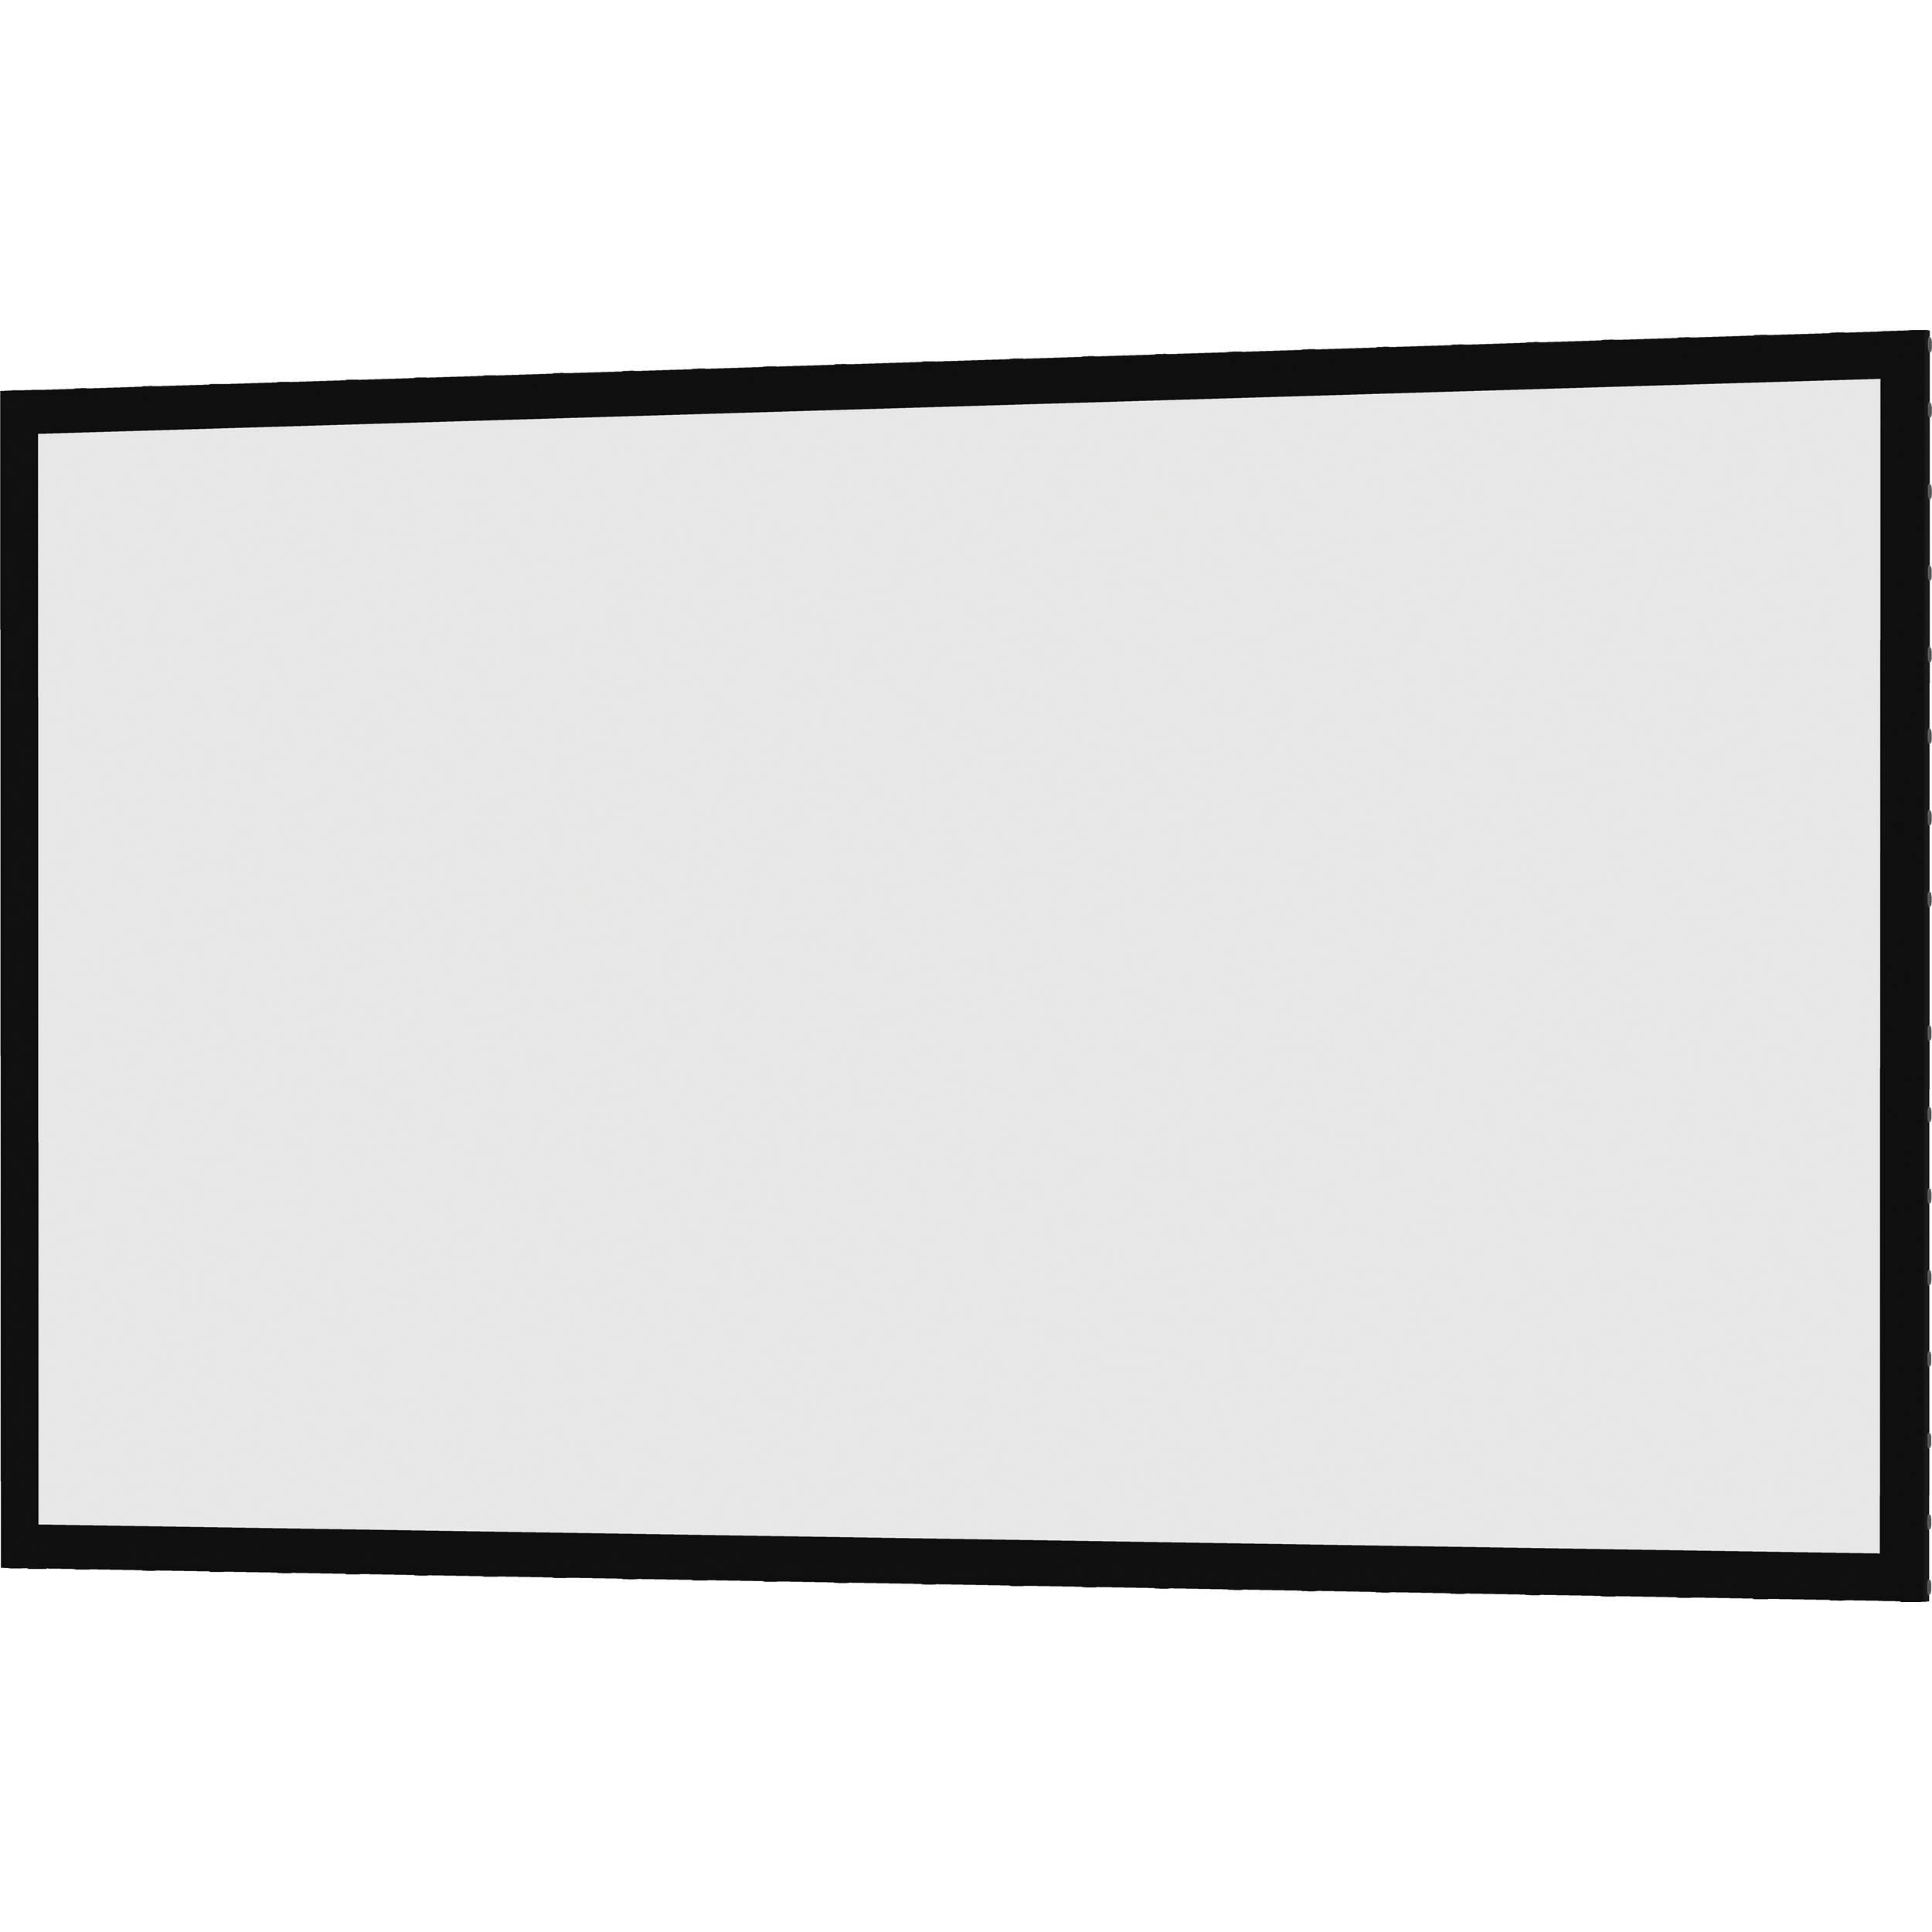 Hermosa Picture Frame Screen Componente - Ideas Personalizadas de ...